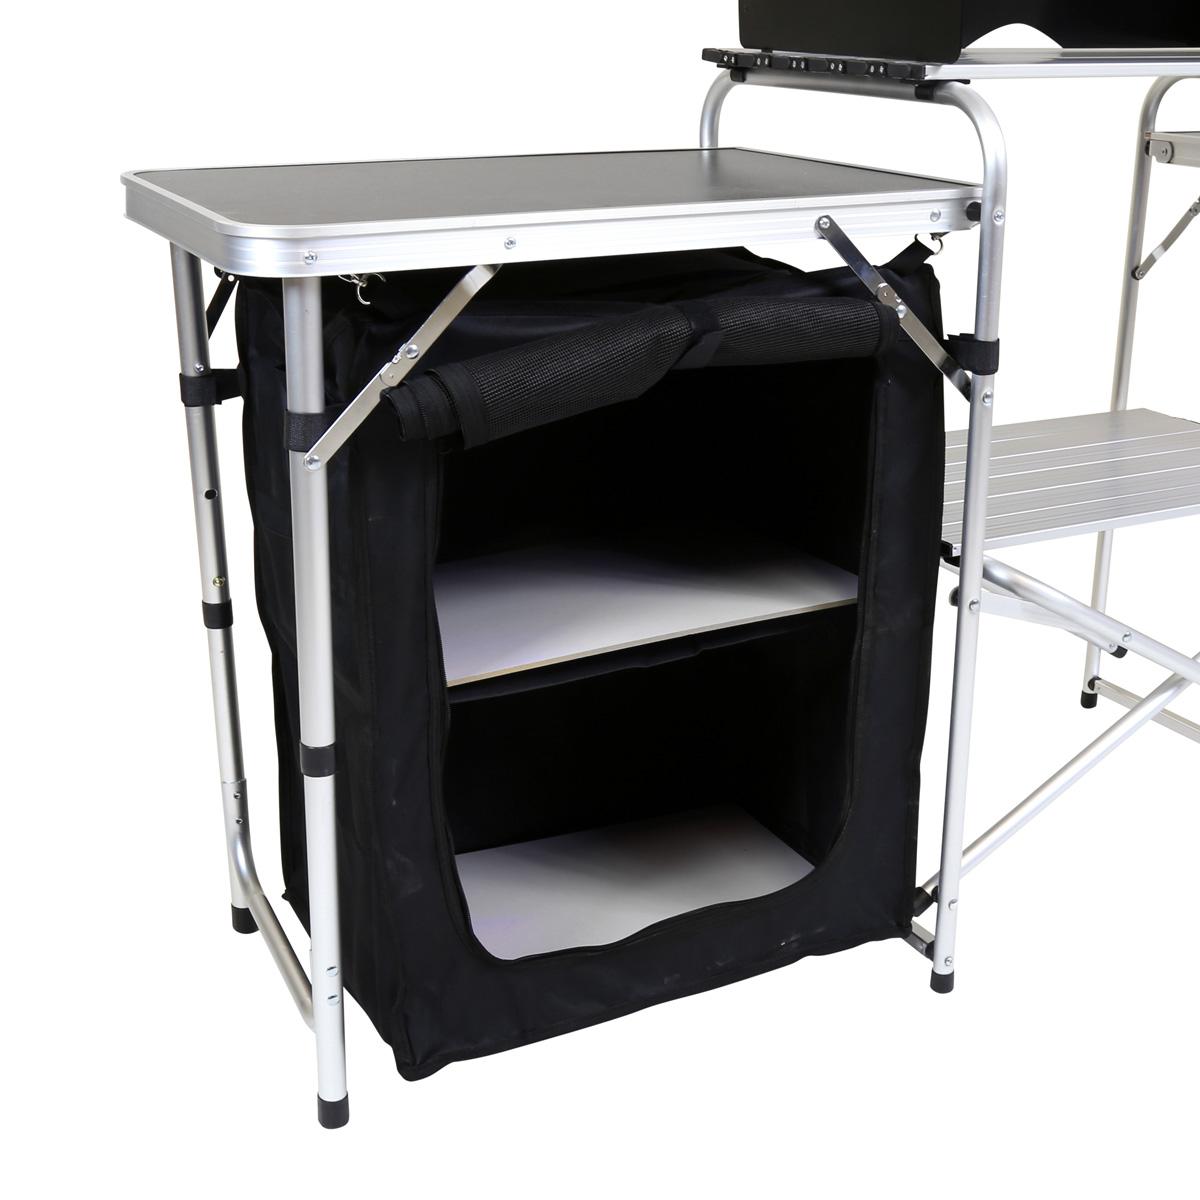 Outdoor Kitchen Units Uk: Charles Bentley Folding Kitchen Camping Storage Unit